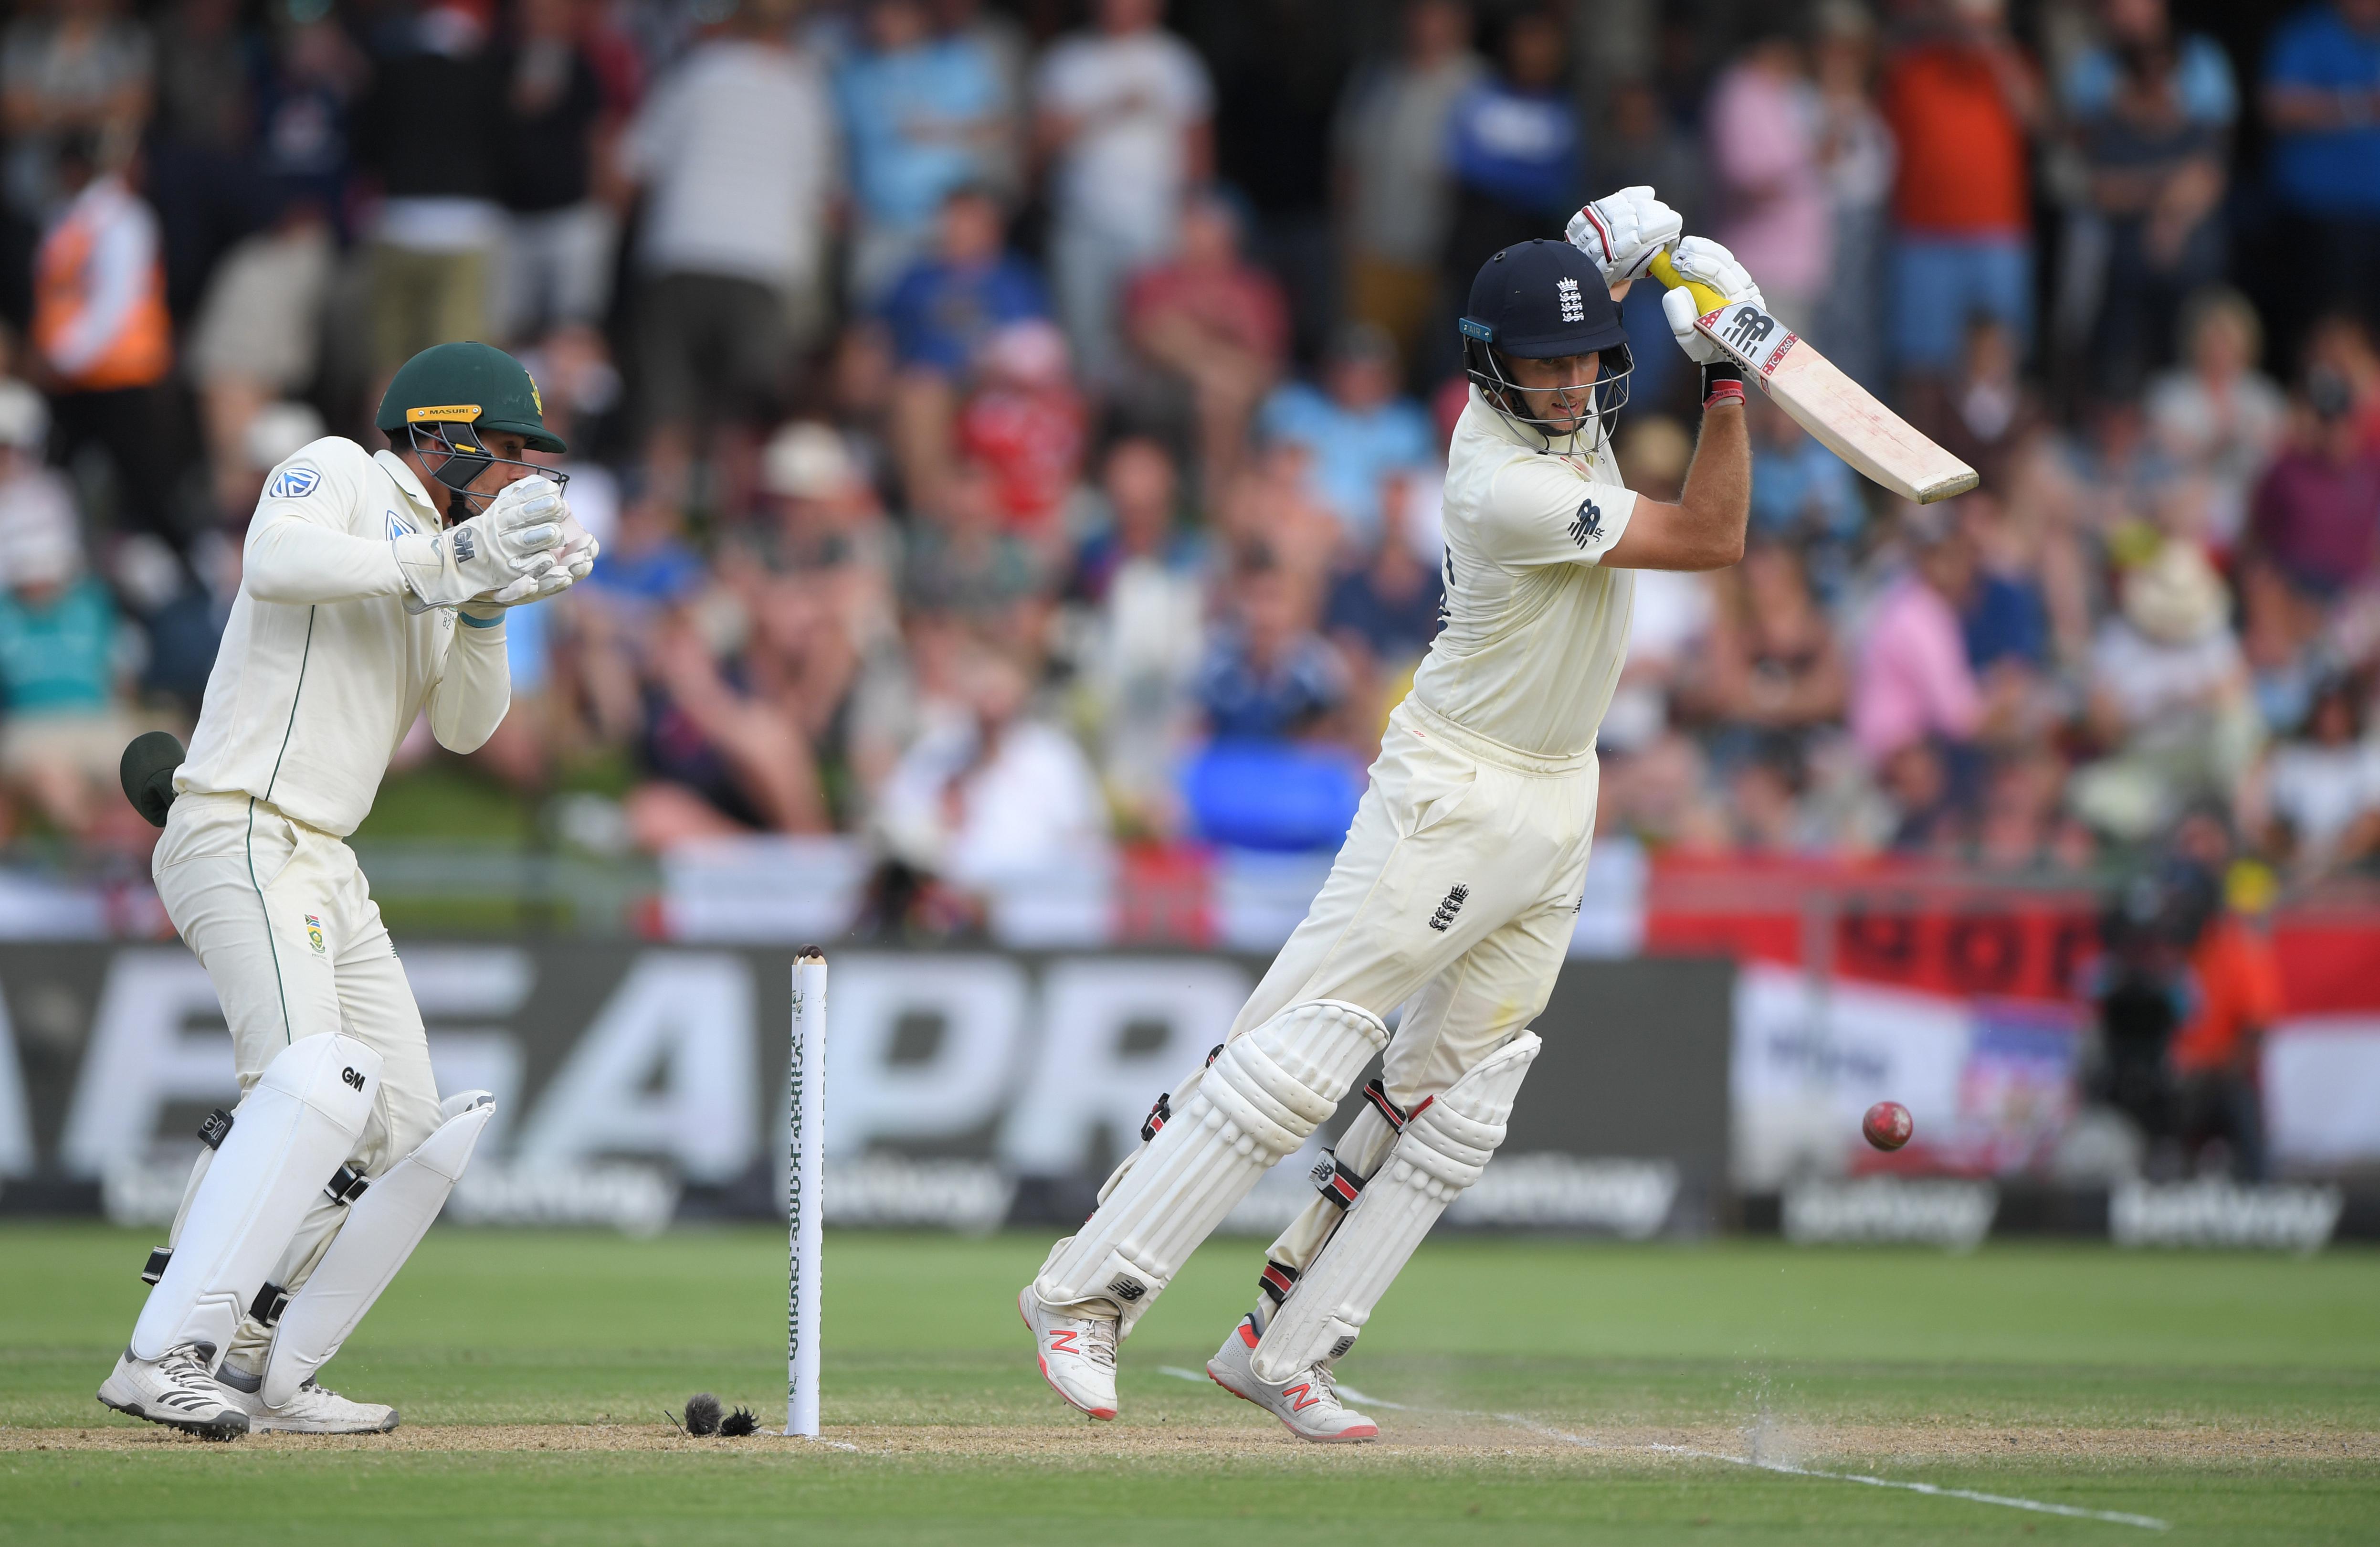 Joe Root Test cricket